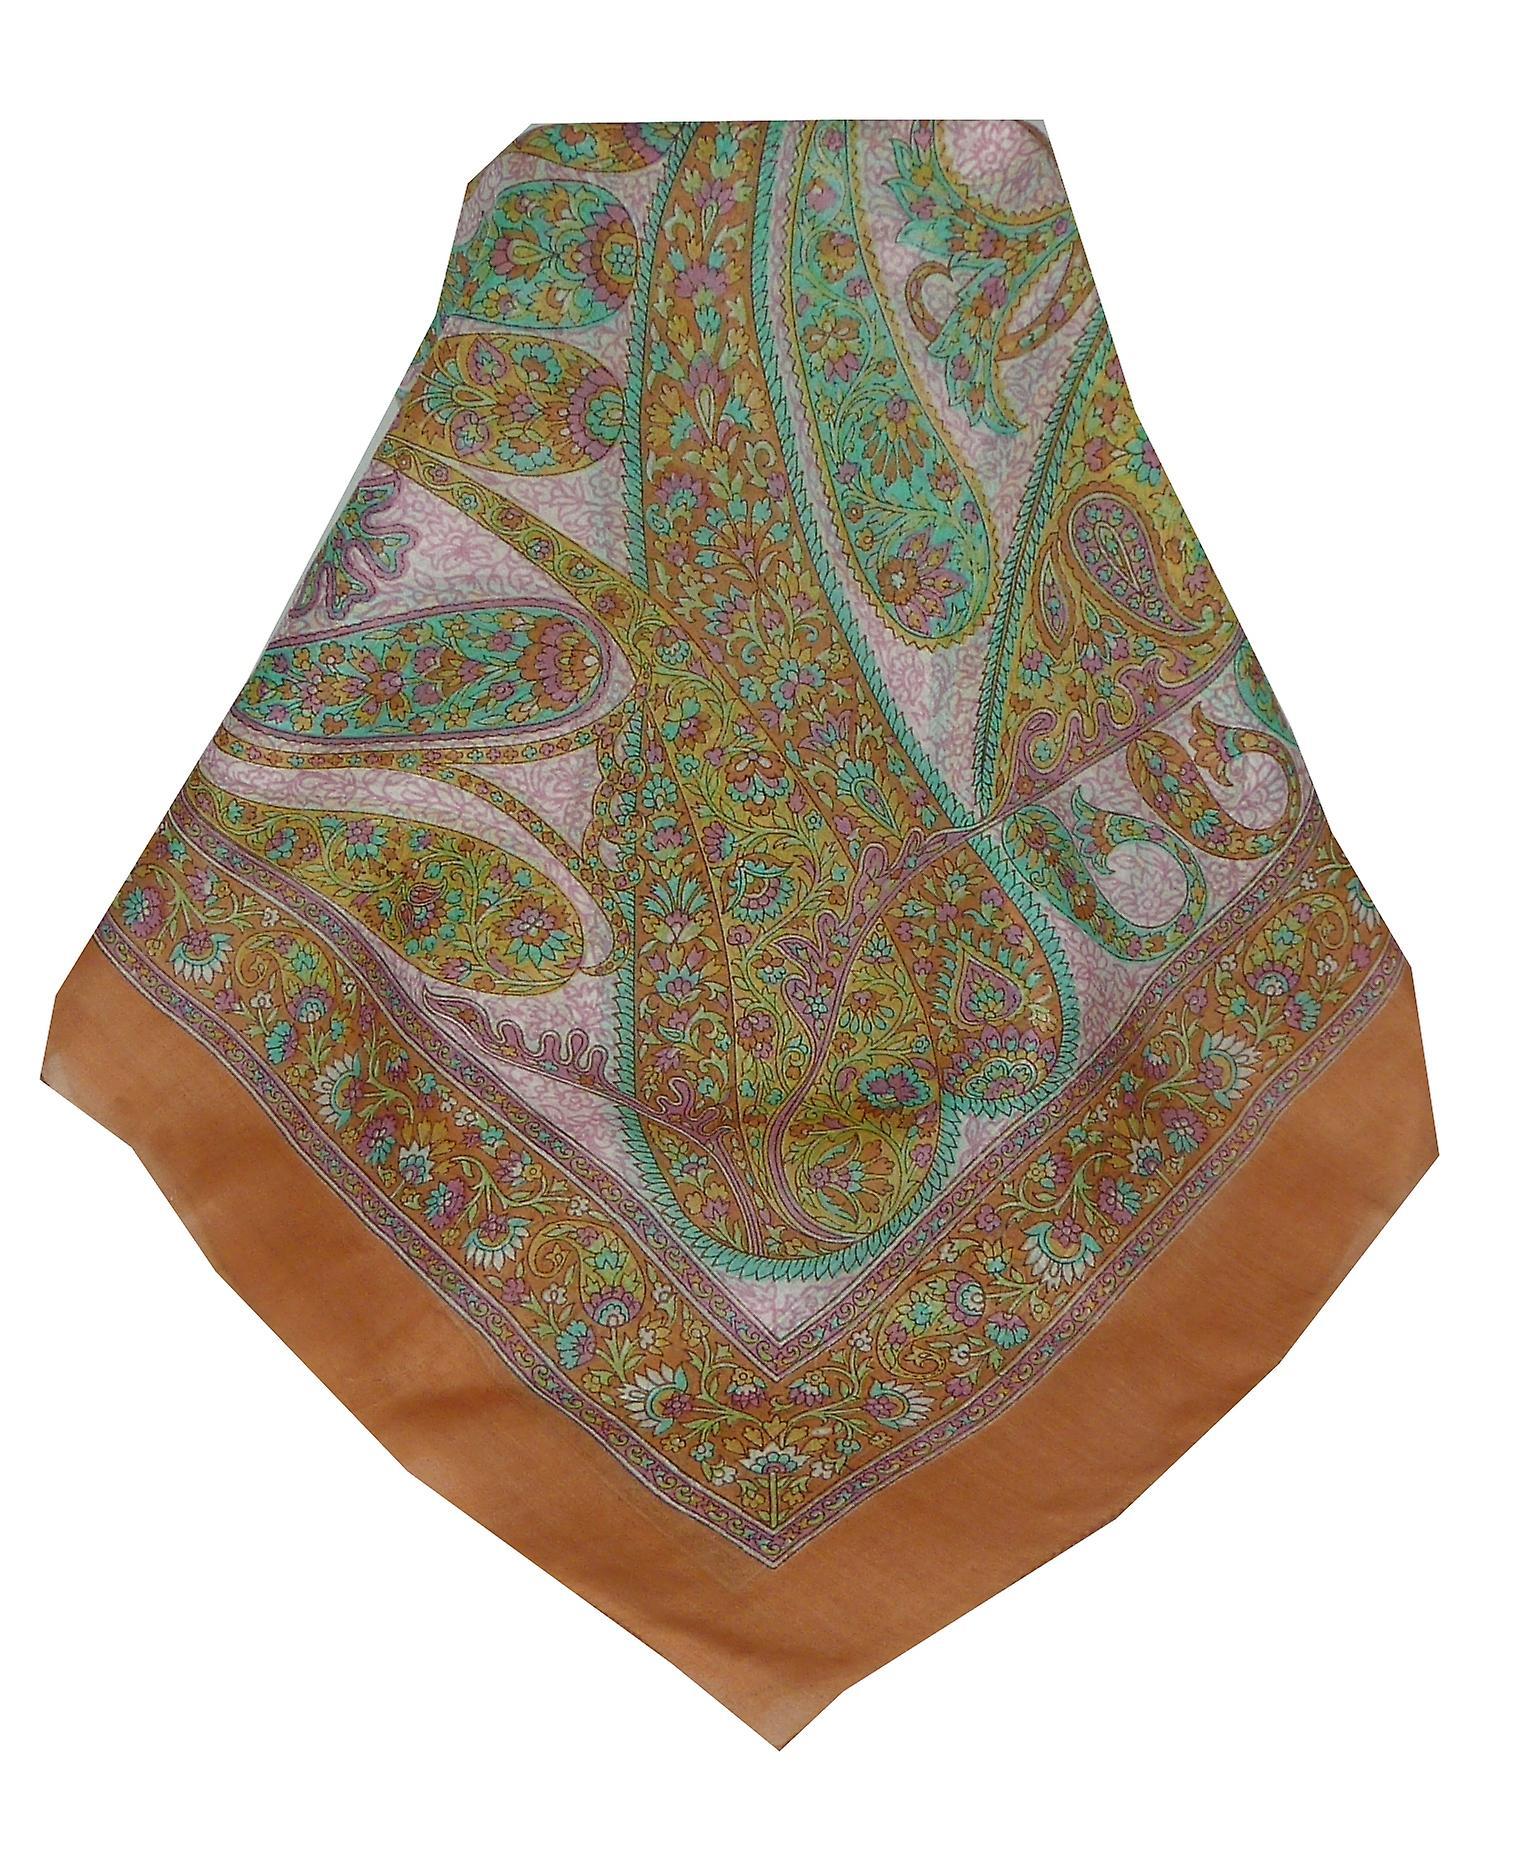 Mulberry Silk Classic Square Scarf Rachol Gold by Pashmina & Silk